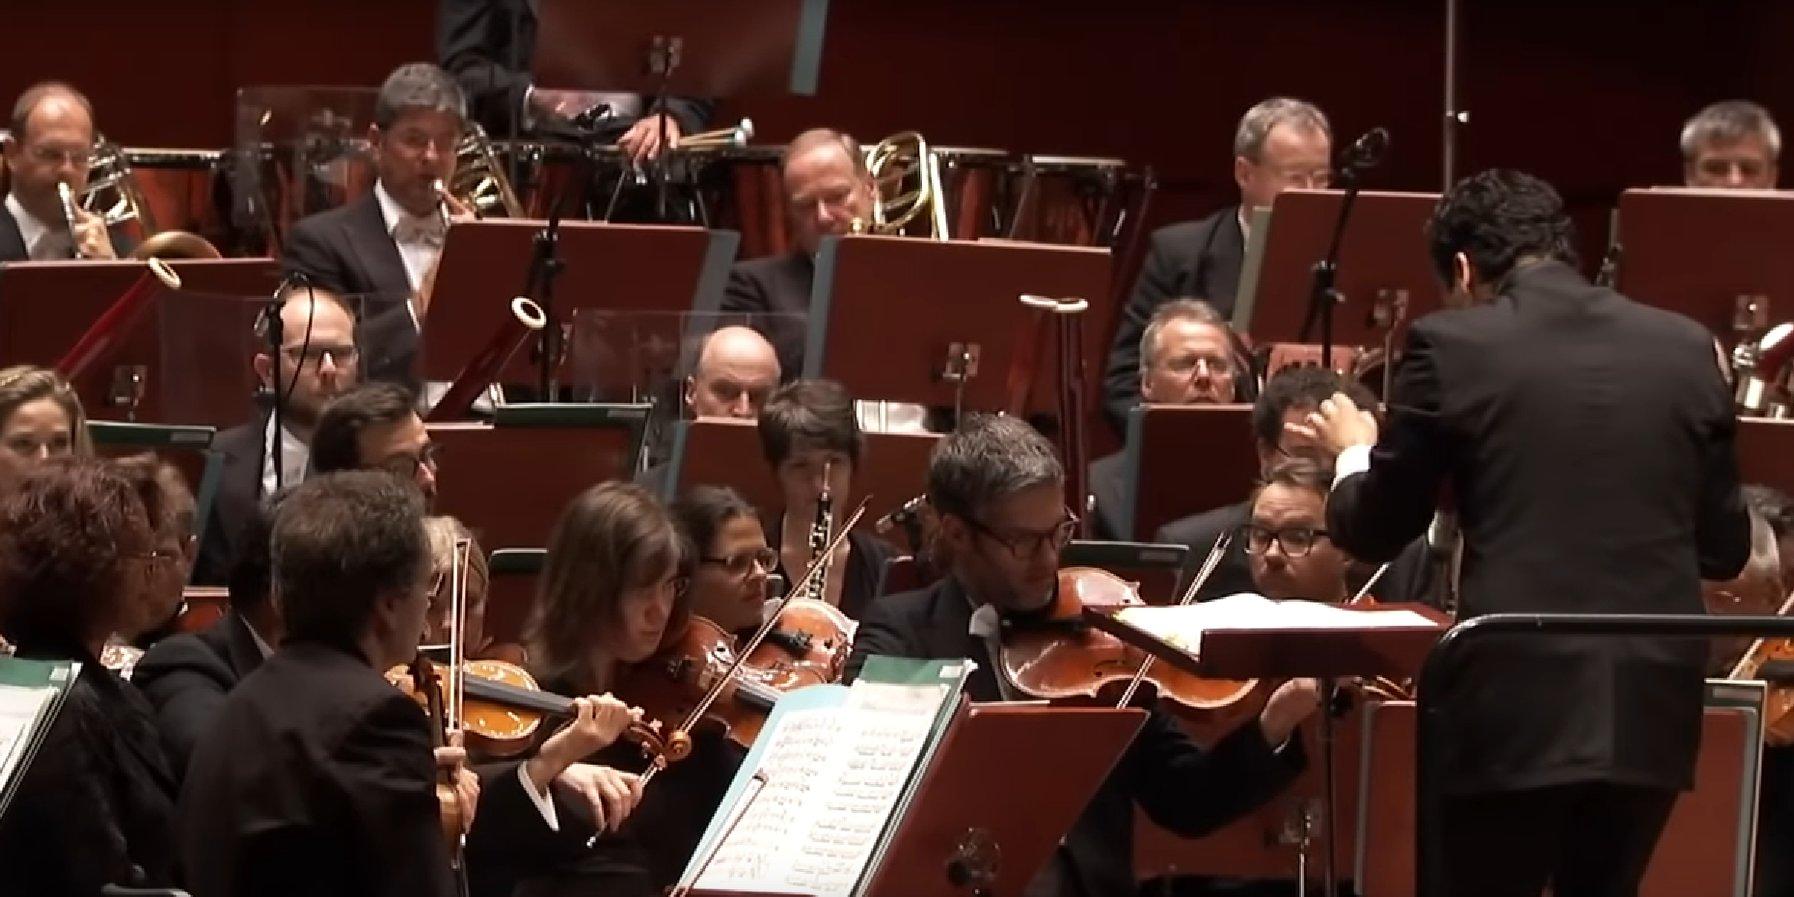 hr-Sinfonieorchester: Stravinsky's »Le sacre du printemps«